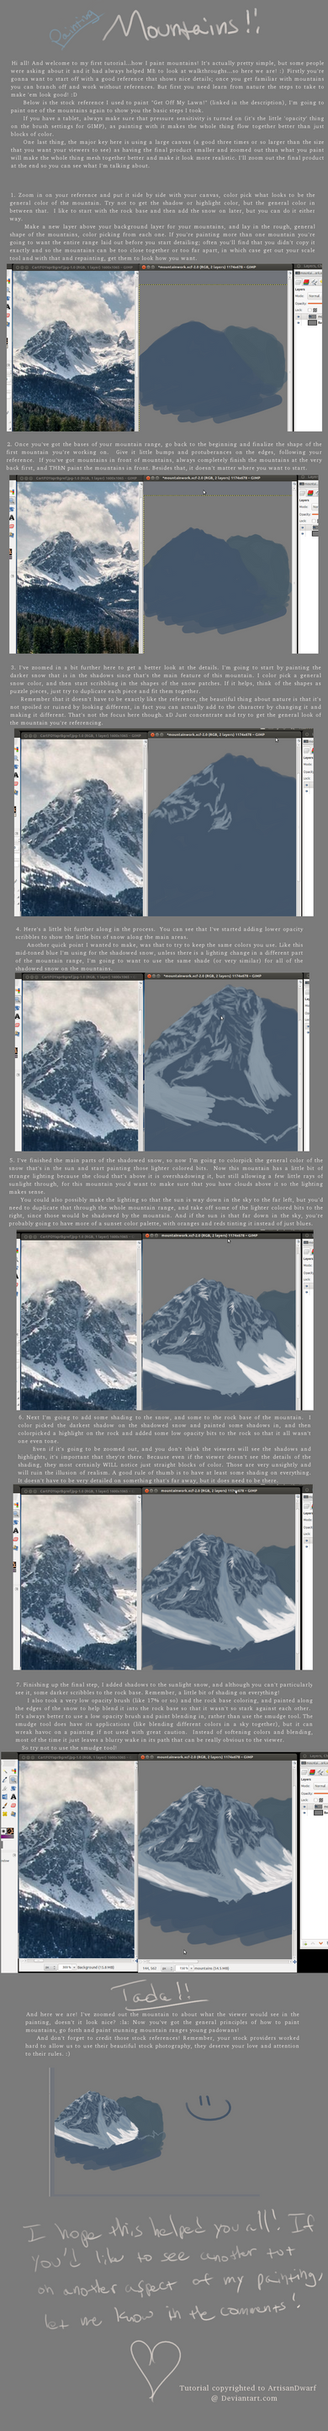 Tutorial: How to Paint Mountains! by Nebunezzari